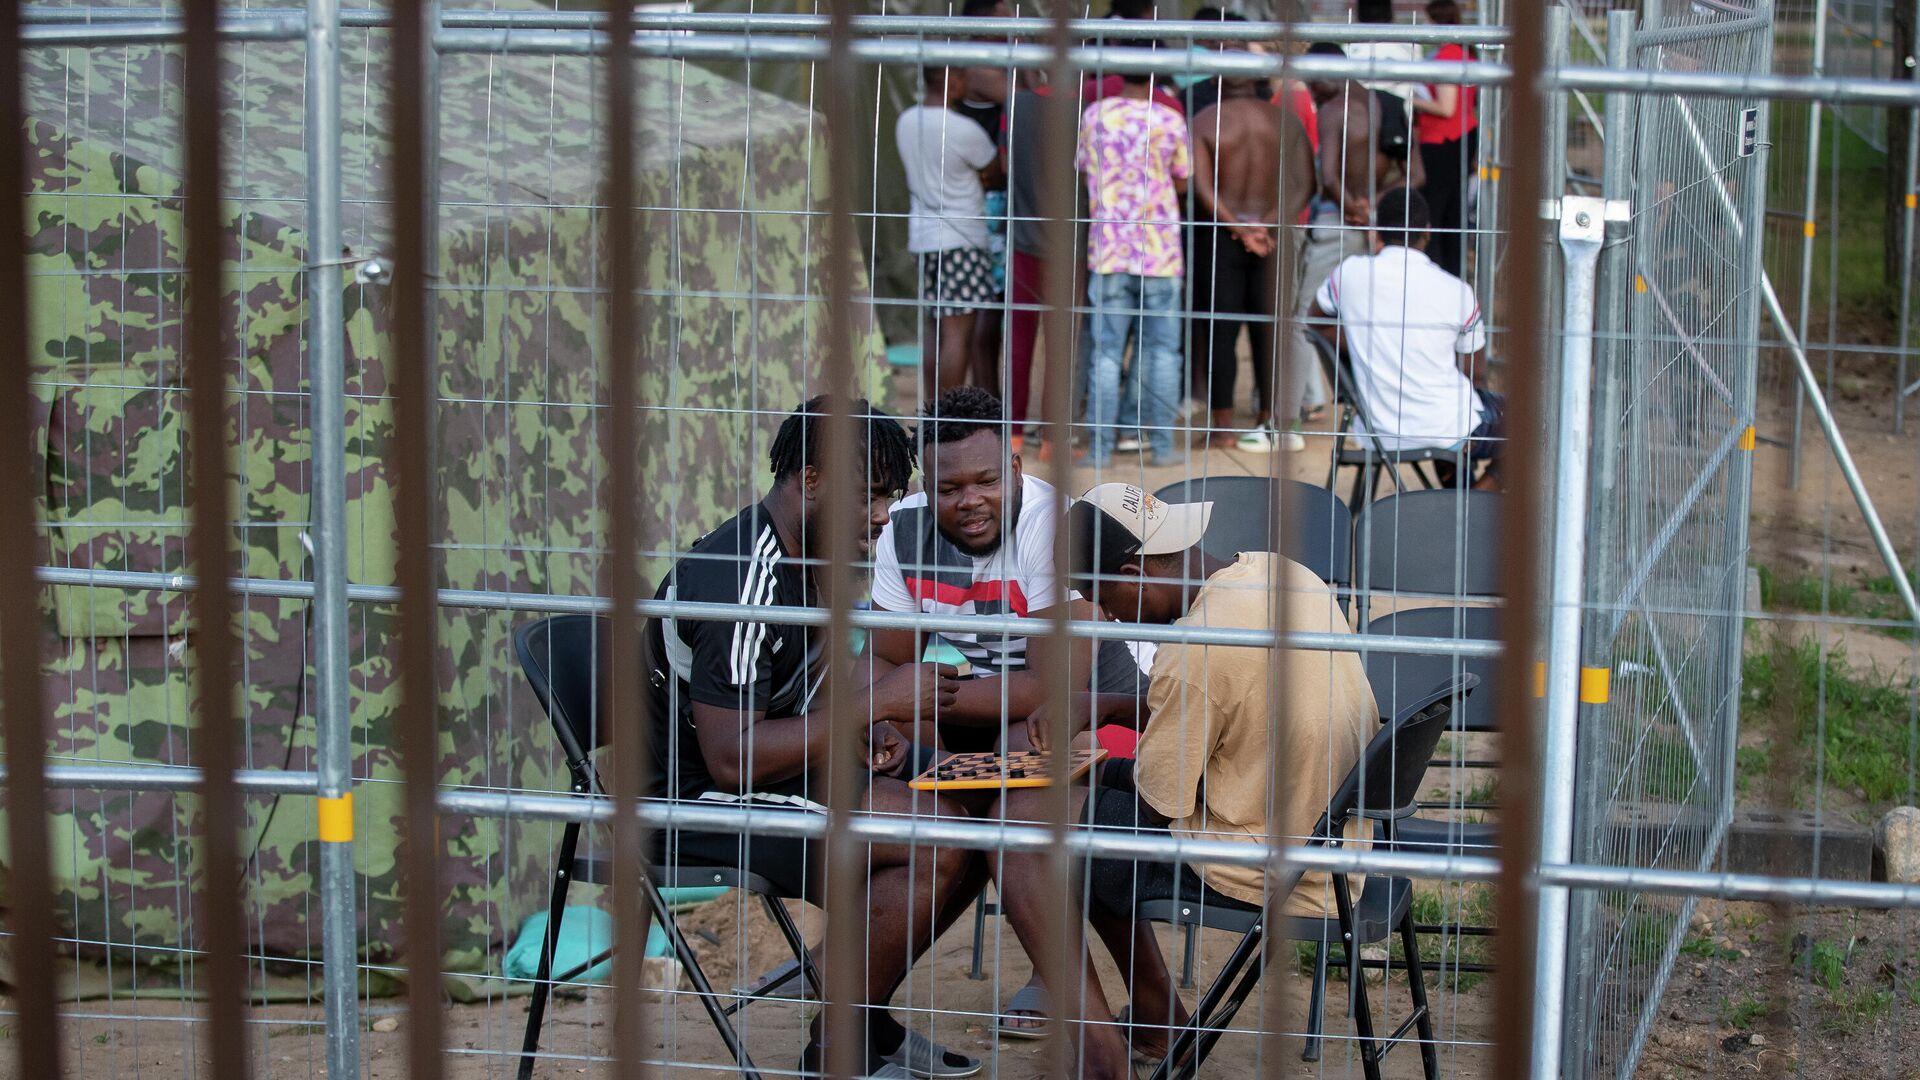 Migranten spielen Dame im neu errichteten Flüchtlingslager in der Stadt Pabrade, Litauen, 8. Juli 2021. - SNA, 1920, 09.07.2021